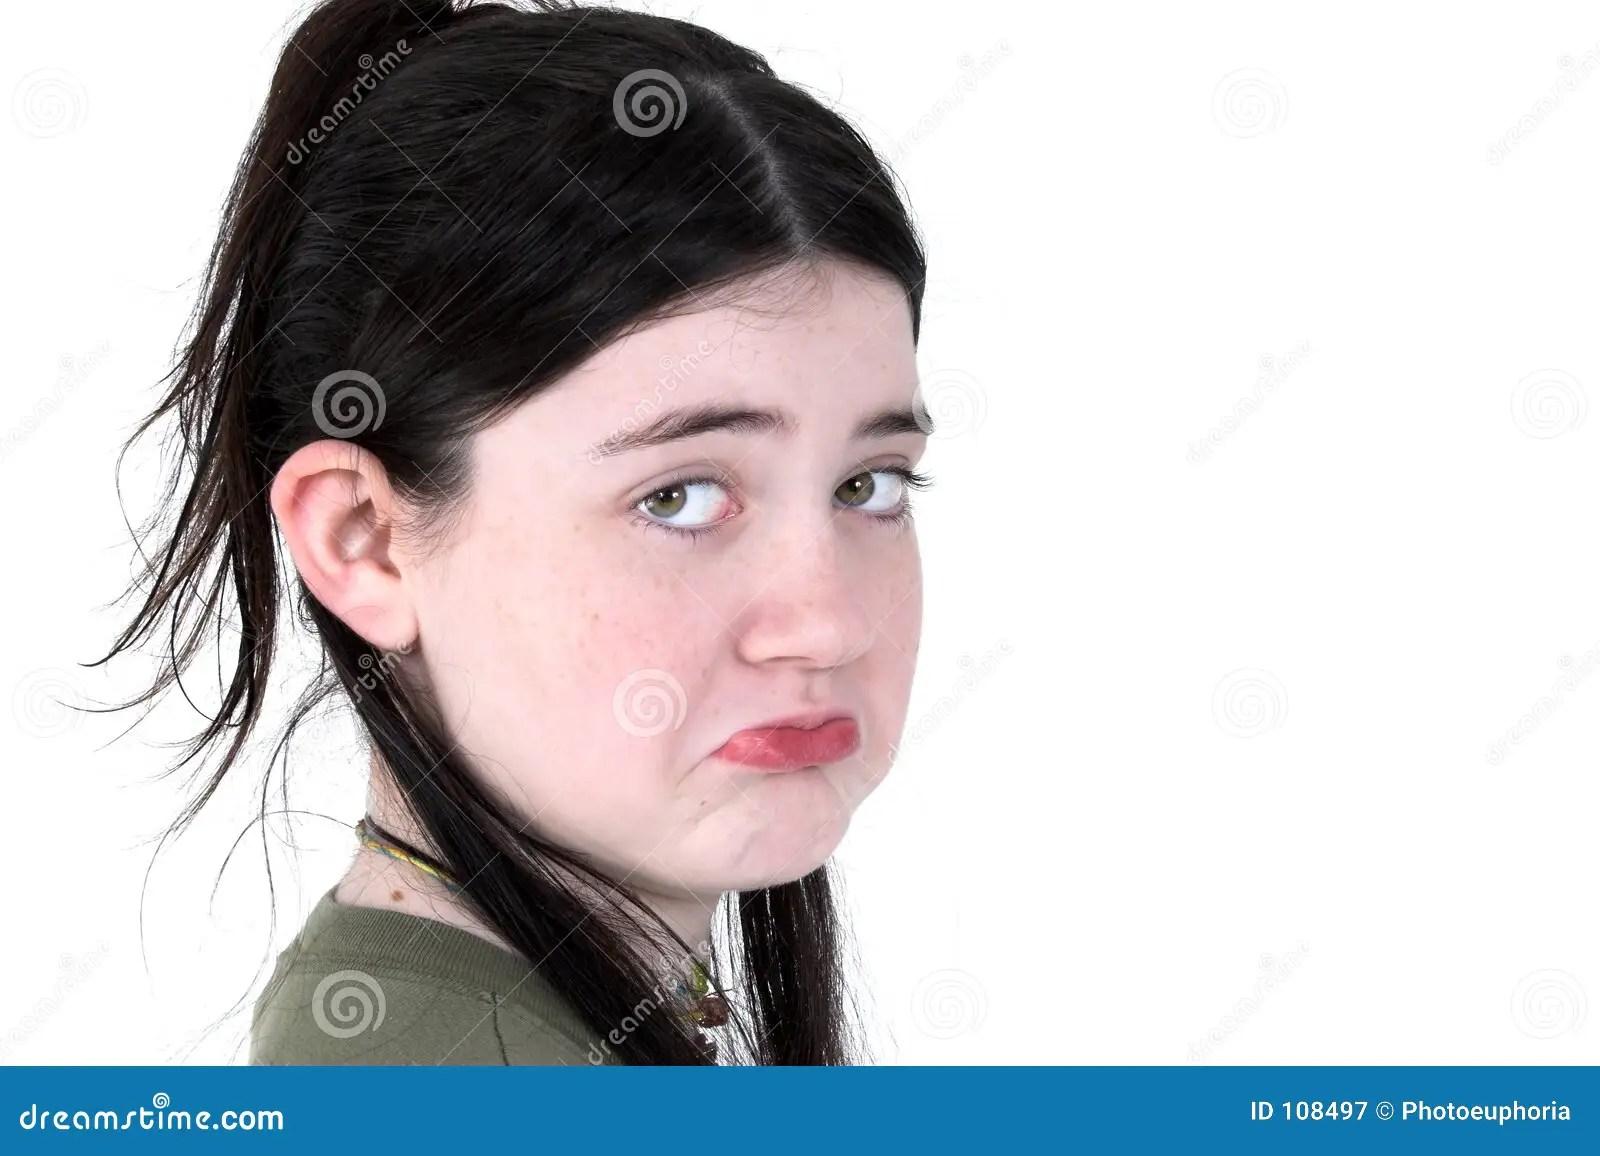 child pouting stock image